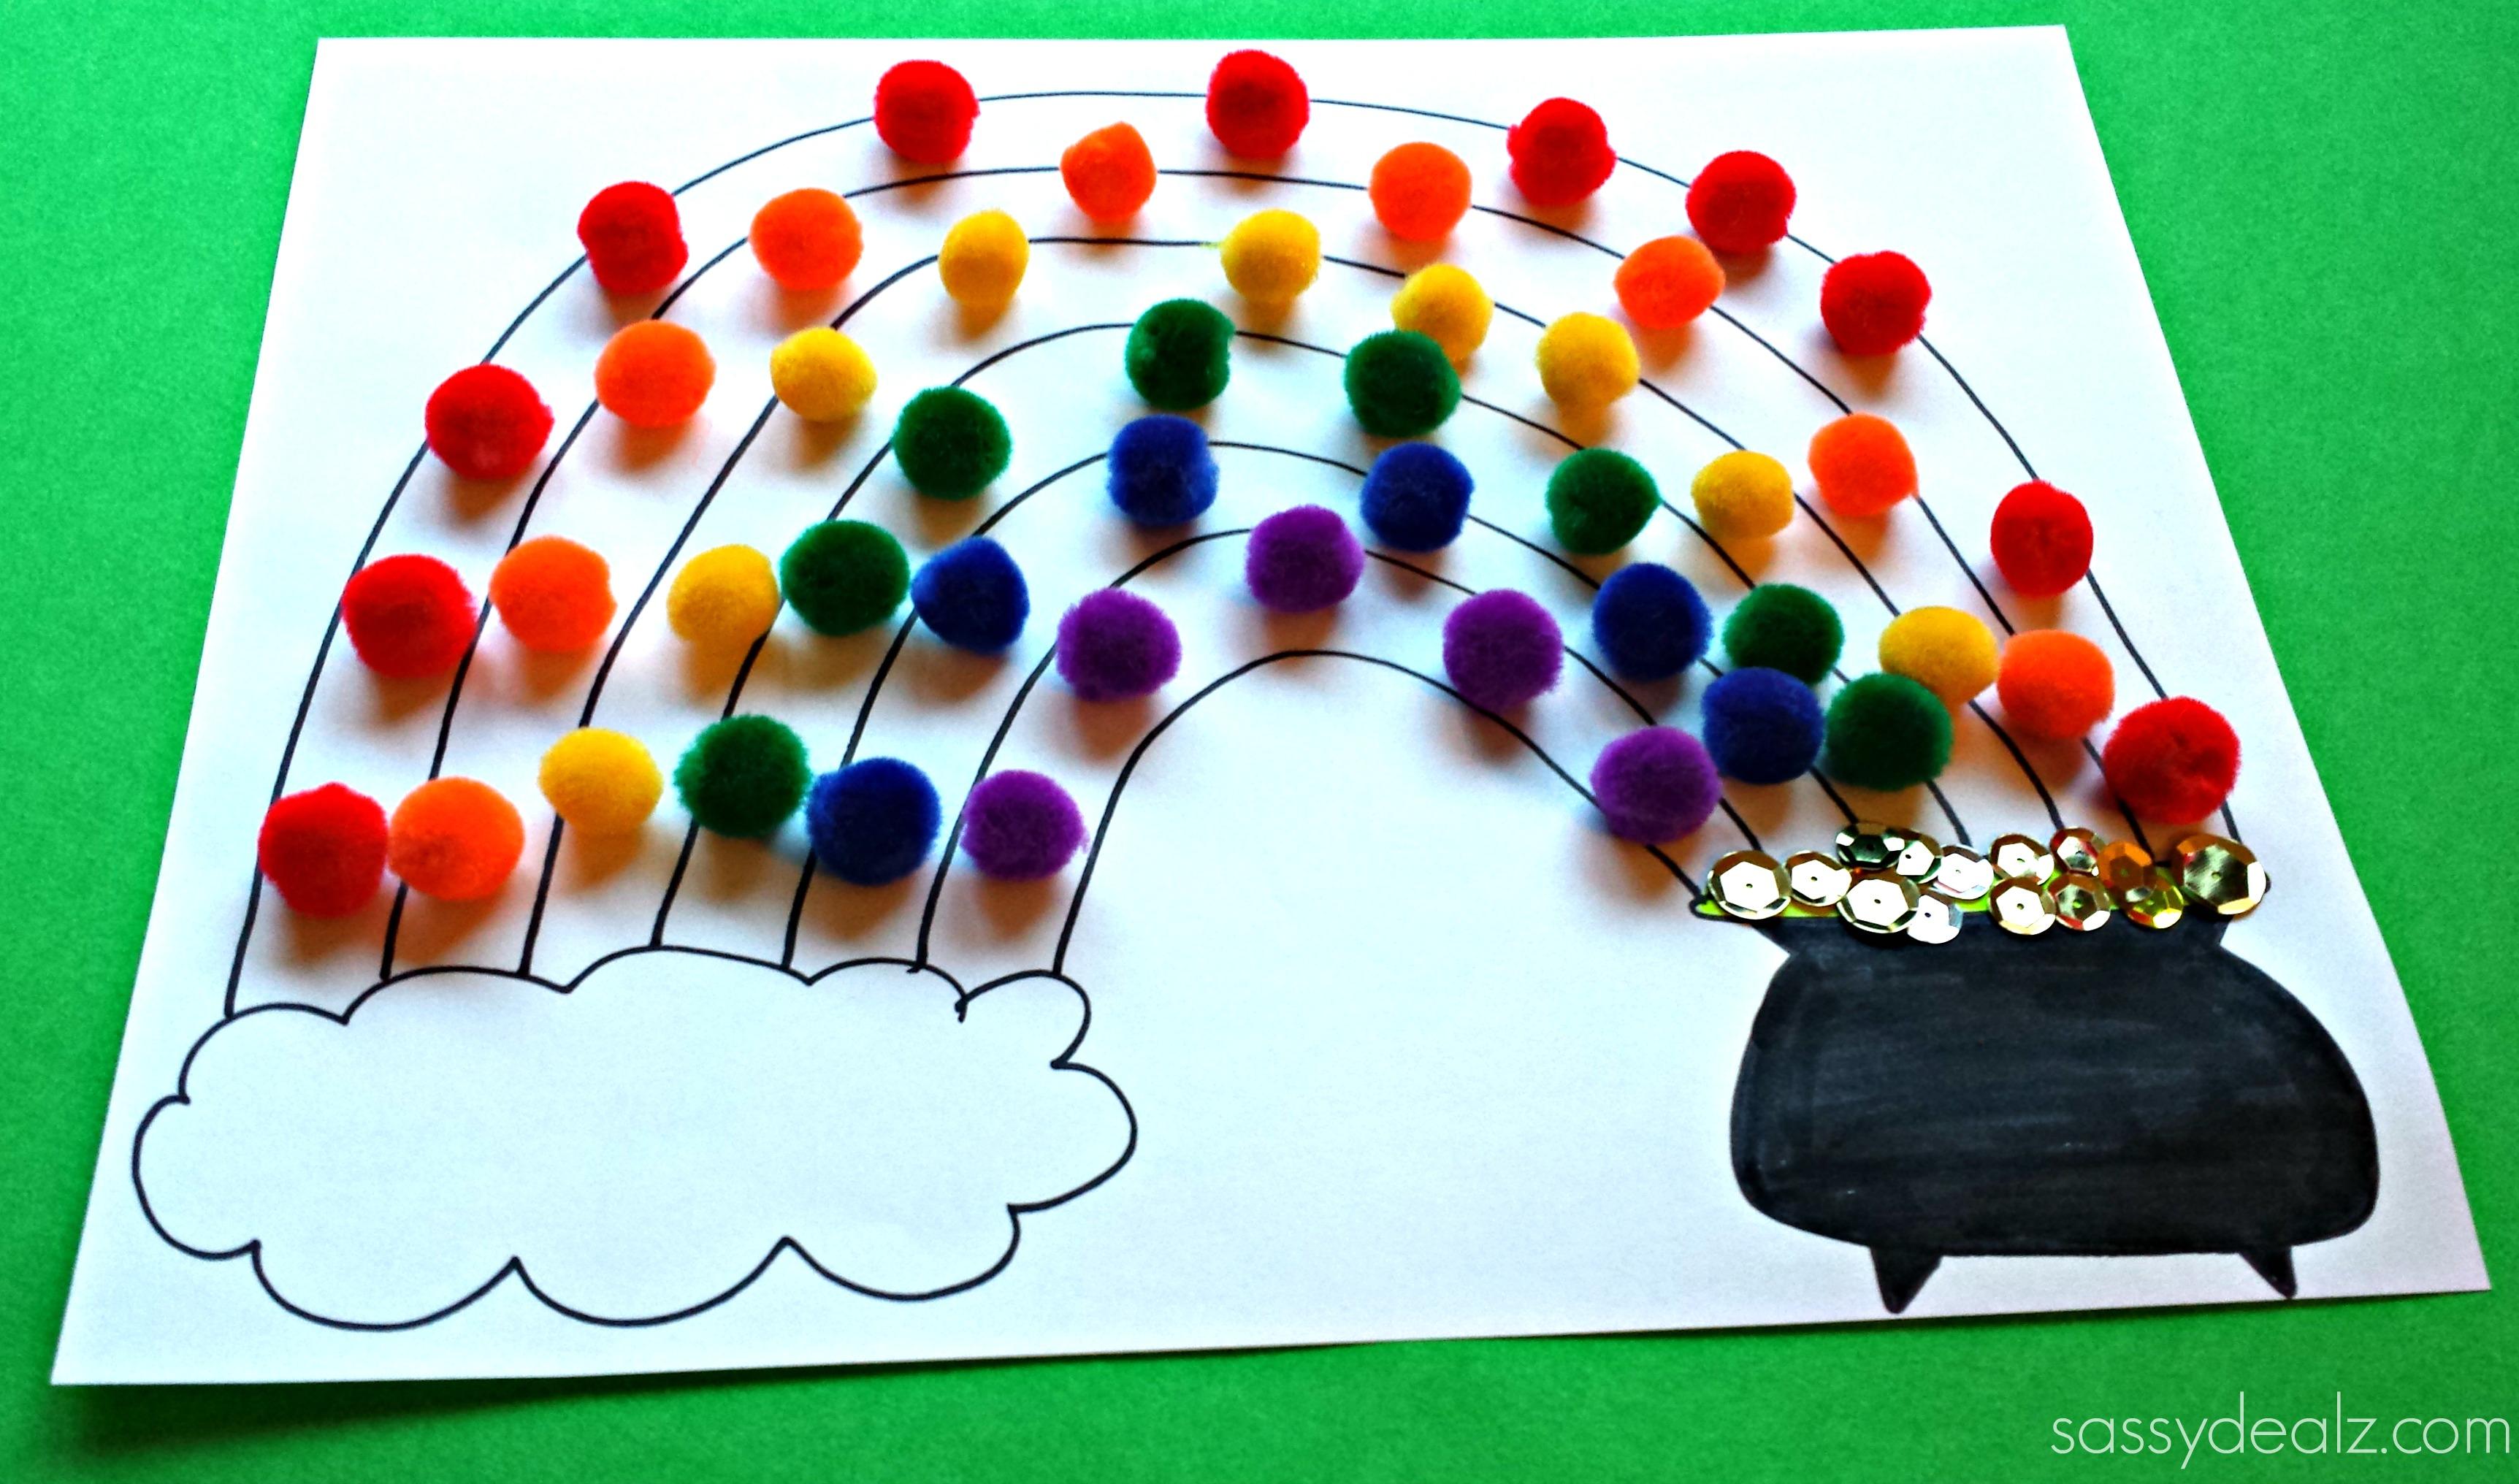 Pom pom rainbow craft for st patrick 39 s day free for Where to buy pom poms for crafts